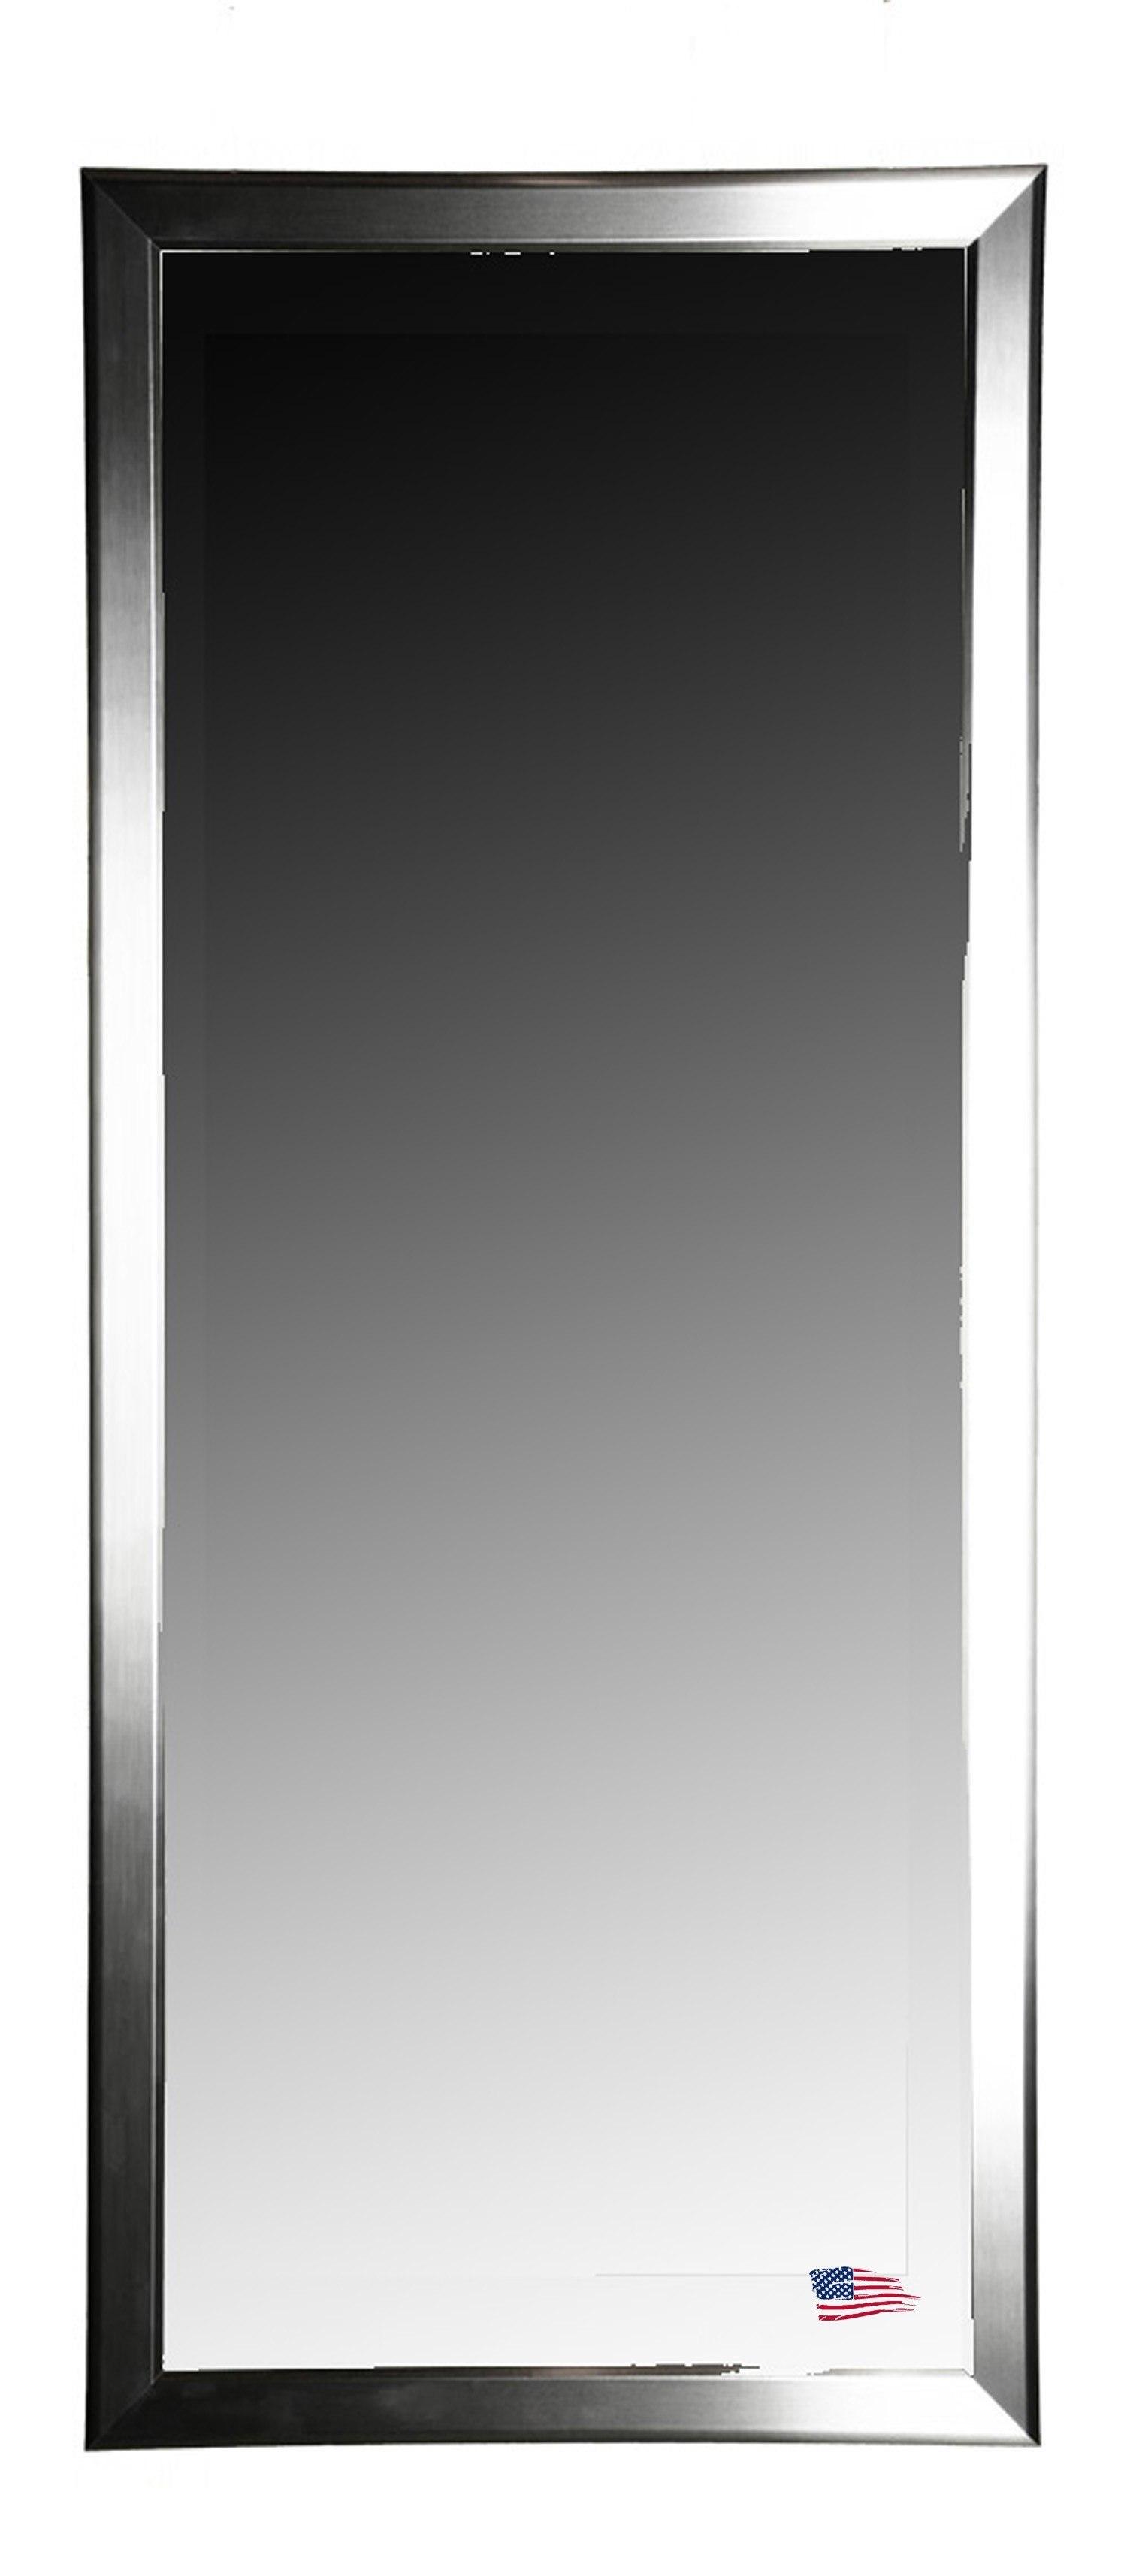 Rayne Mirrors R001T 29 x 64 Inch Silver Round Floor Mirror